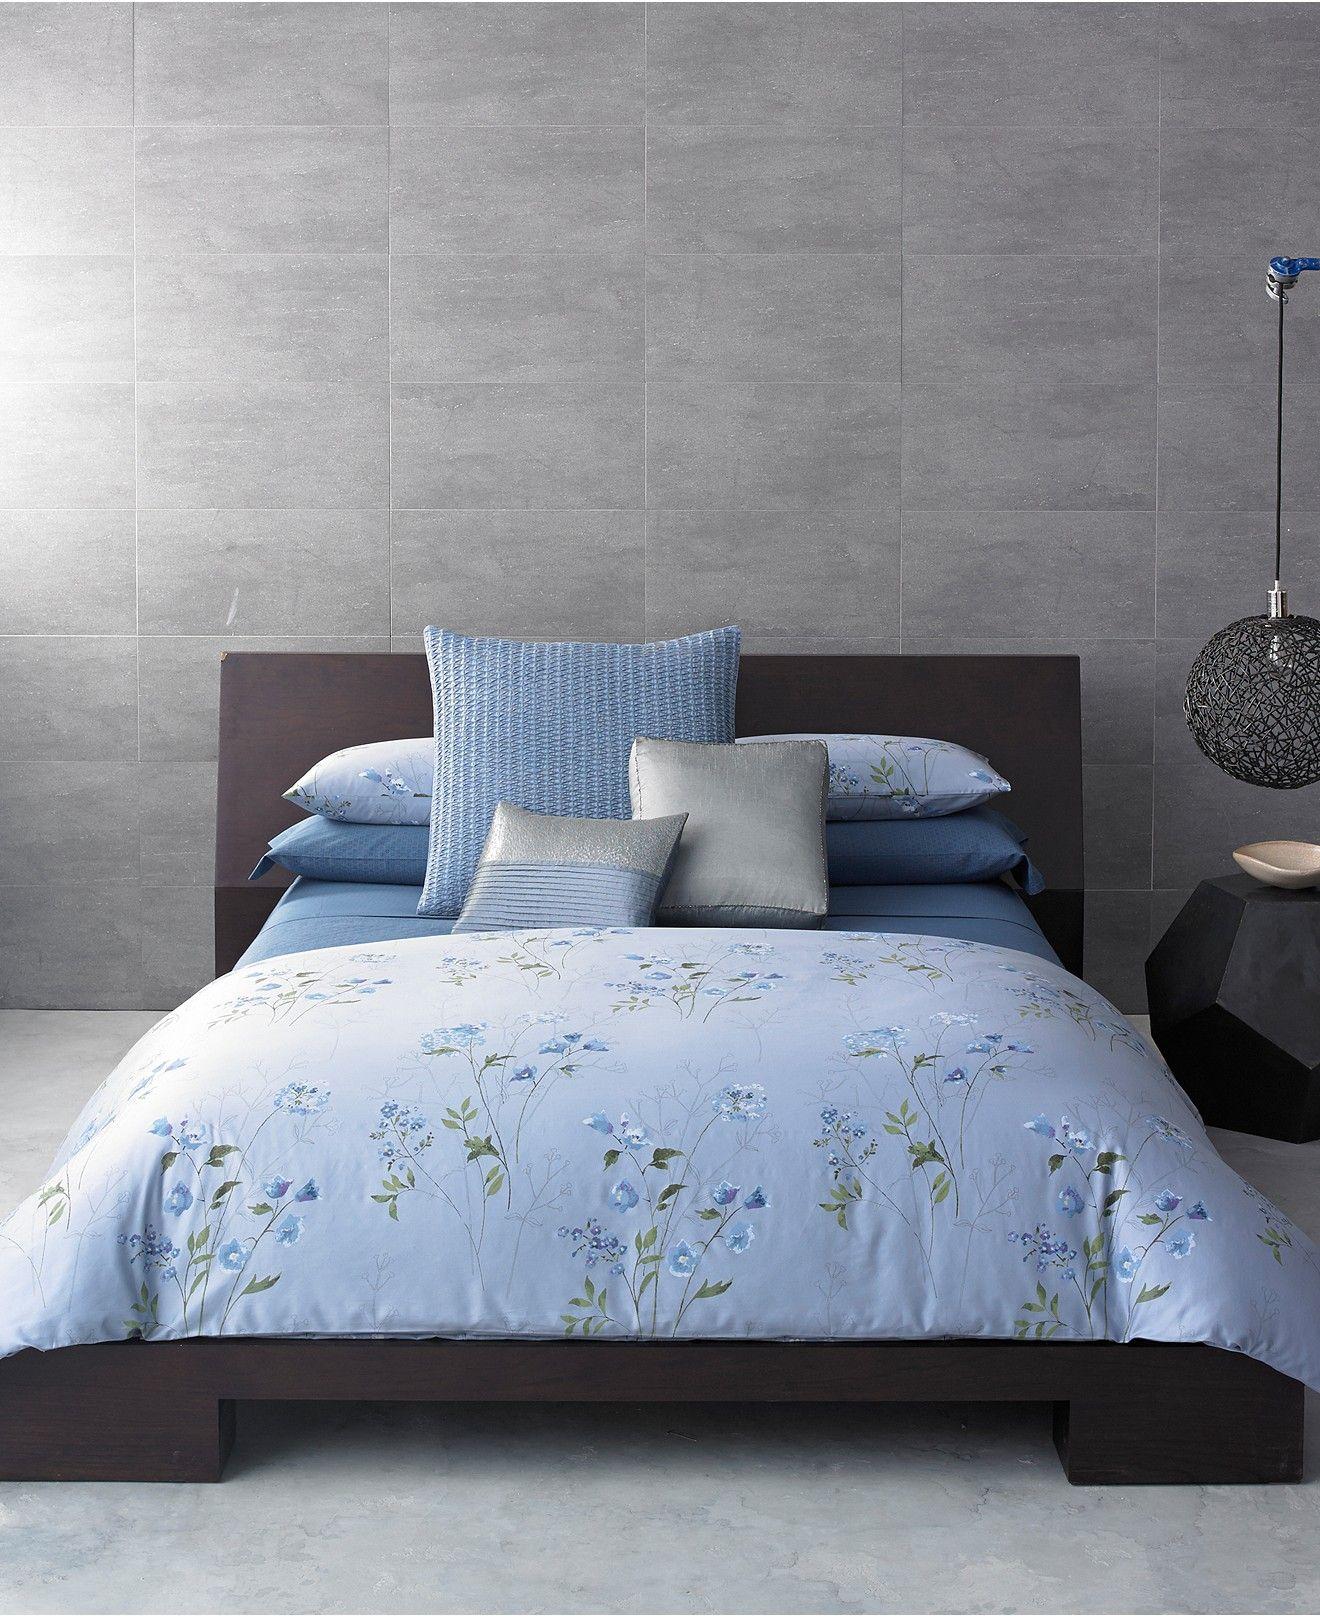 Calvin Klein Shenandoah King Comforter Set Bedding Collections Bed Bath Macy S King Comforter Sets Coverlet Bedding Home Decor Bedding